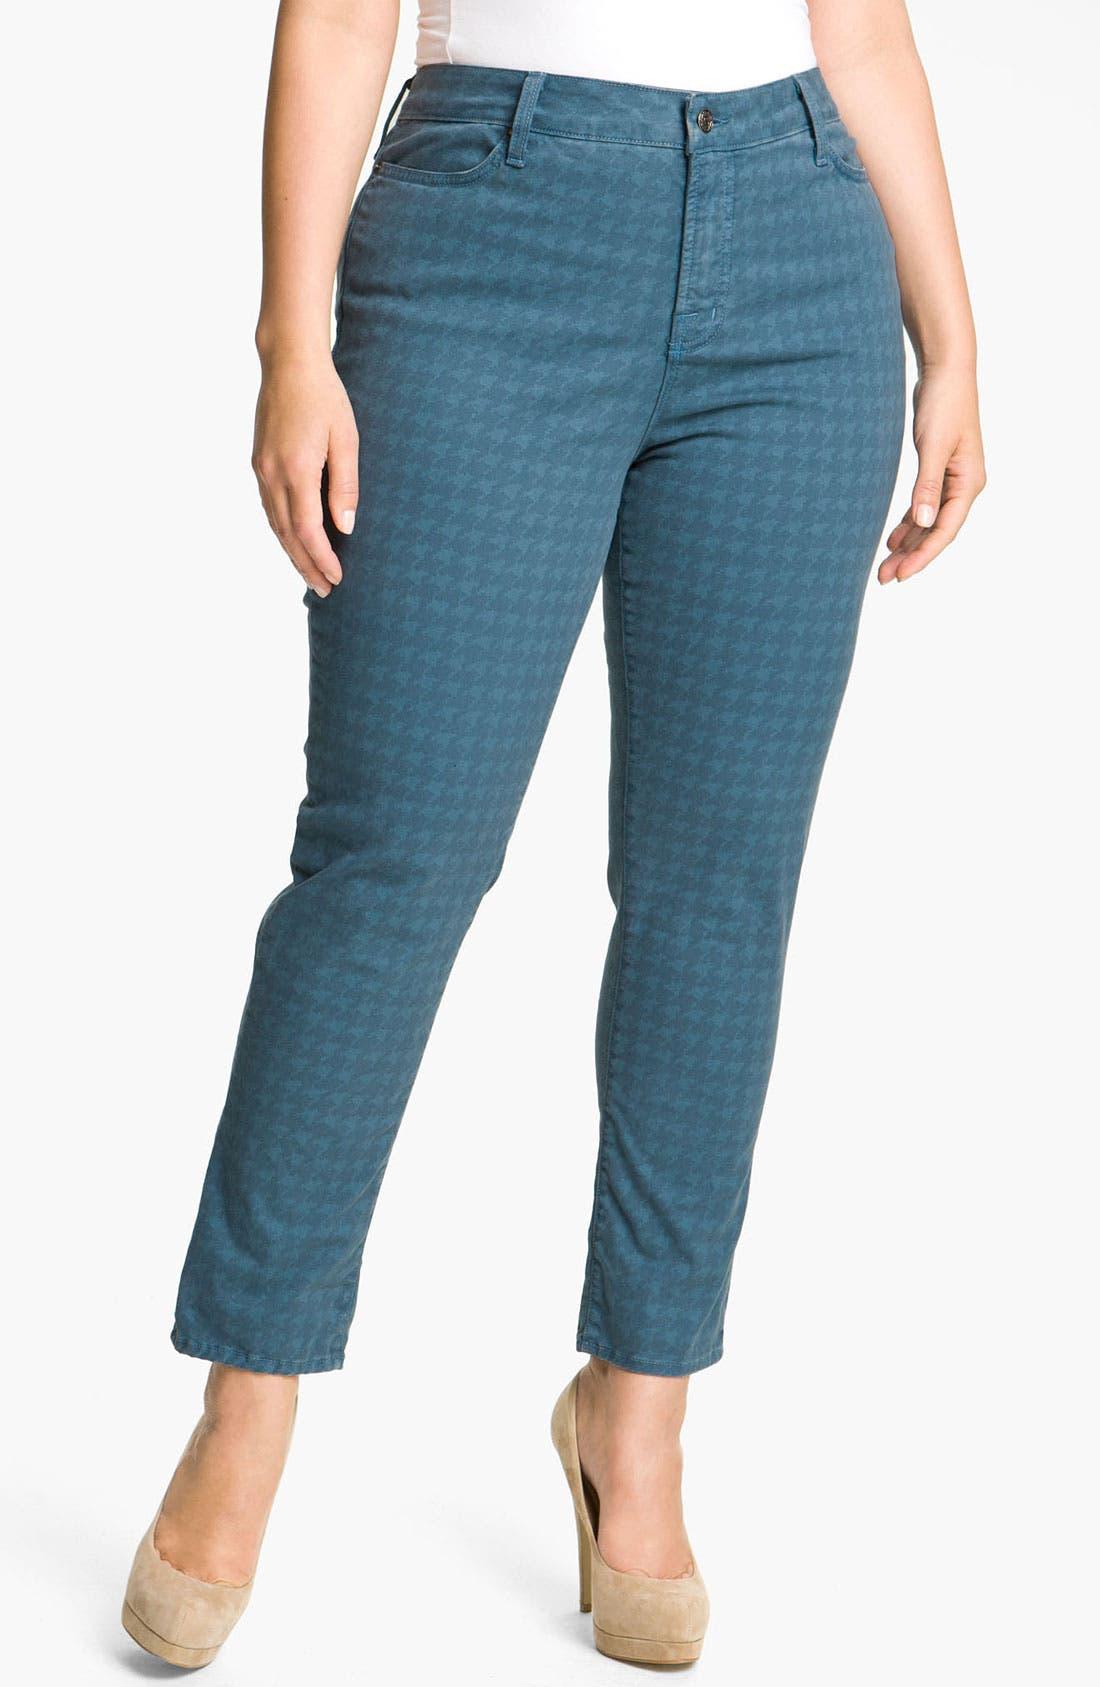 Alternate Image 3  - Blue Essence Houndstooth Twill Jeans (Plus)